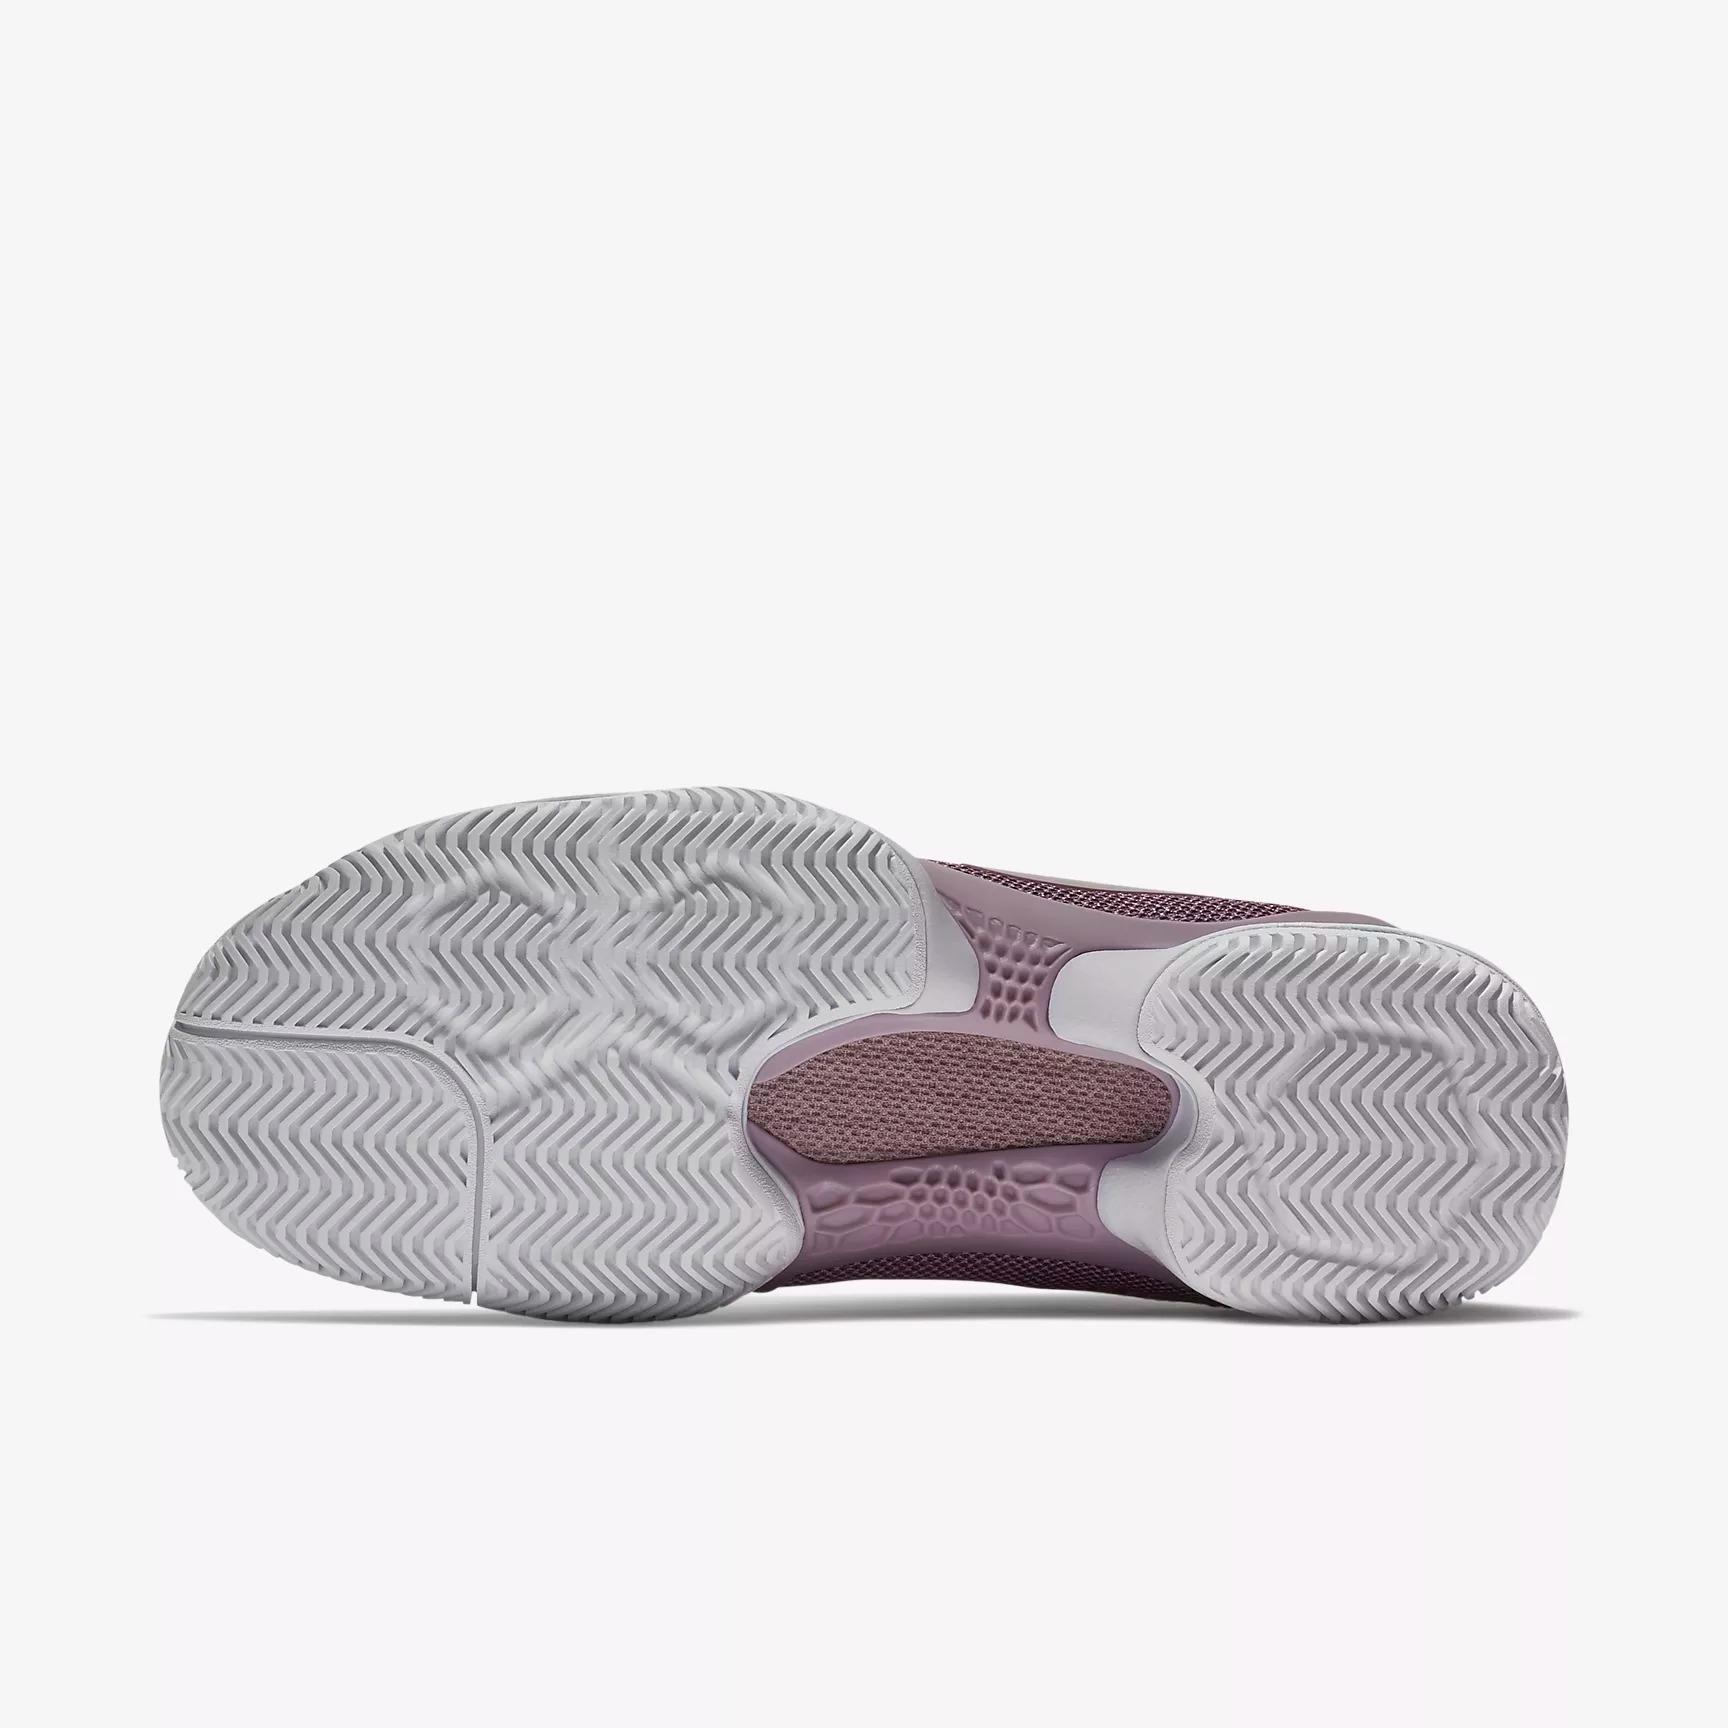 React Nike Ultra Tennis Sport Zoom Shoes Wmns Air Hc IH9ED2